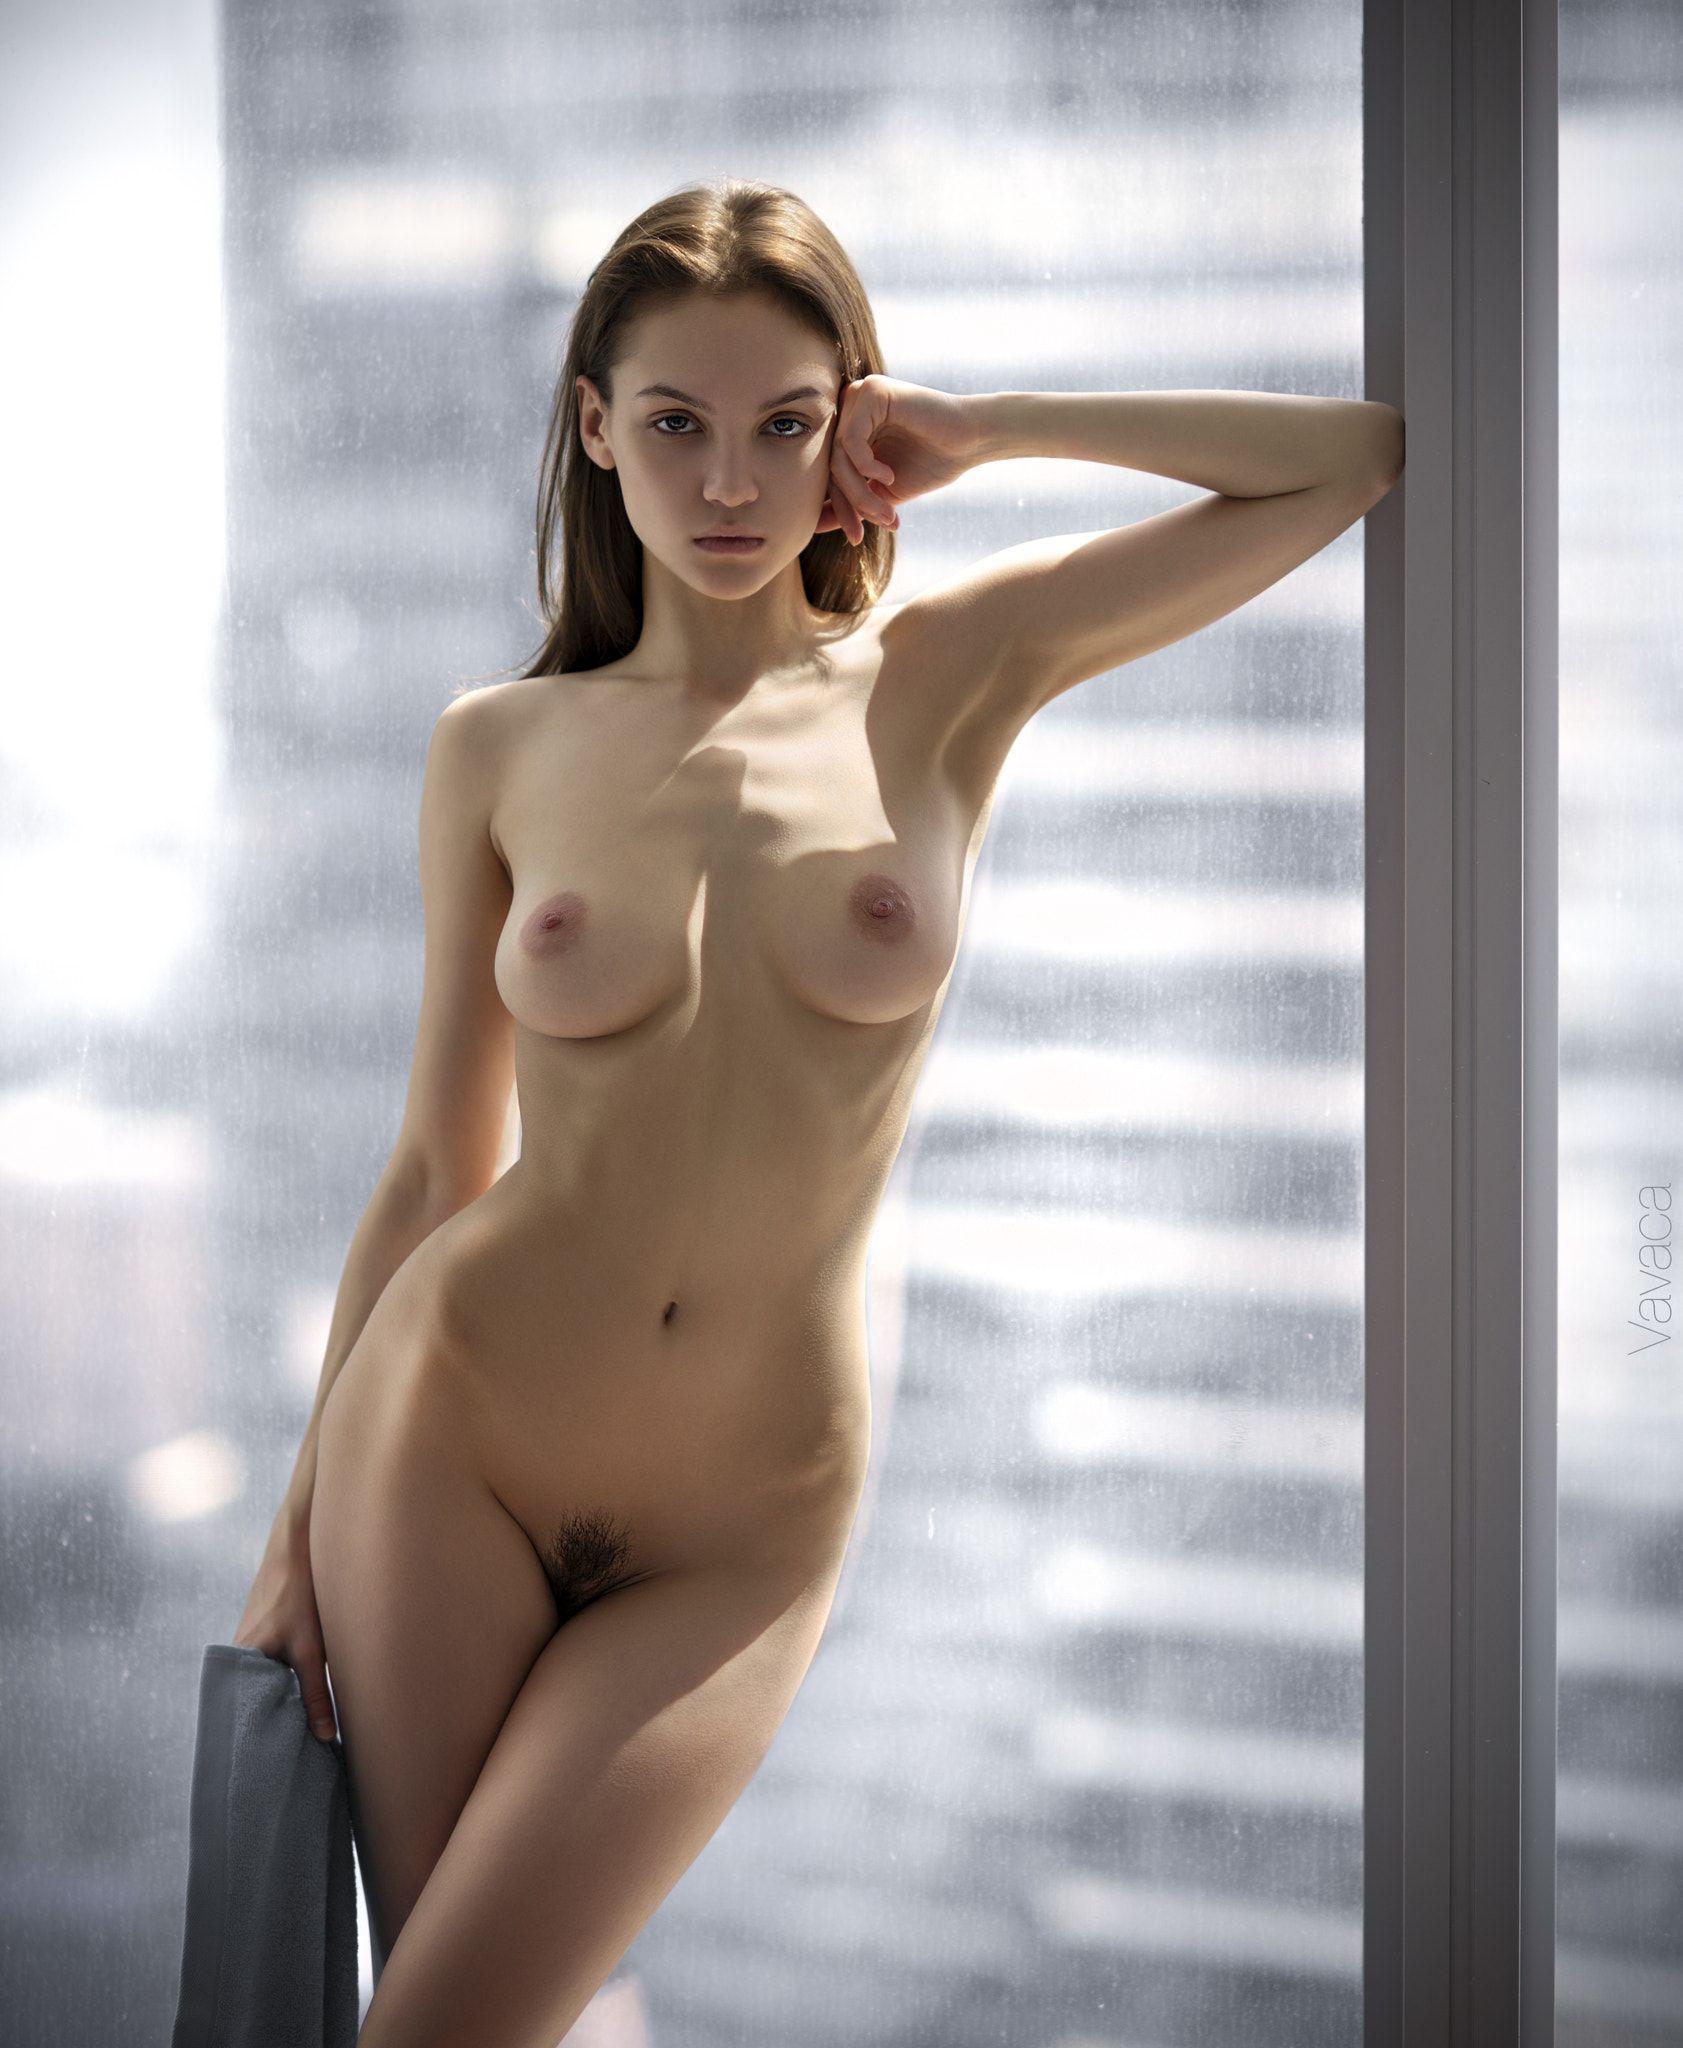 Celeberty nude shoots